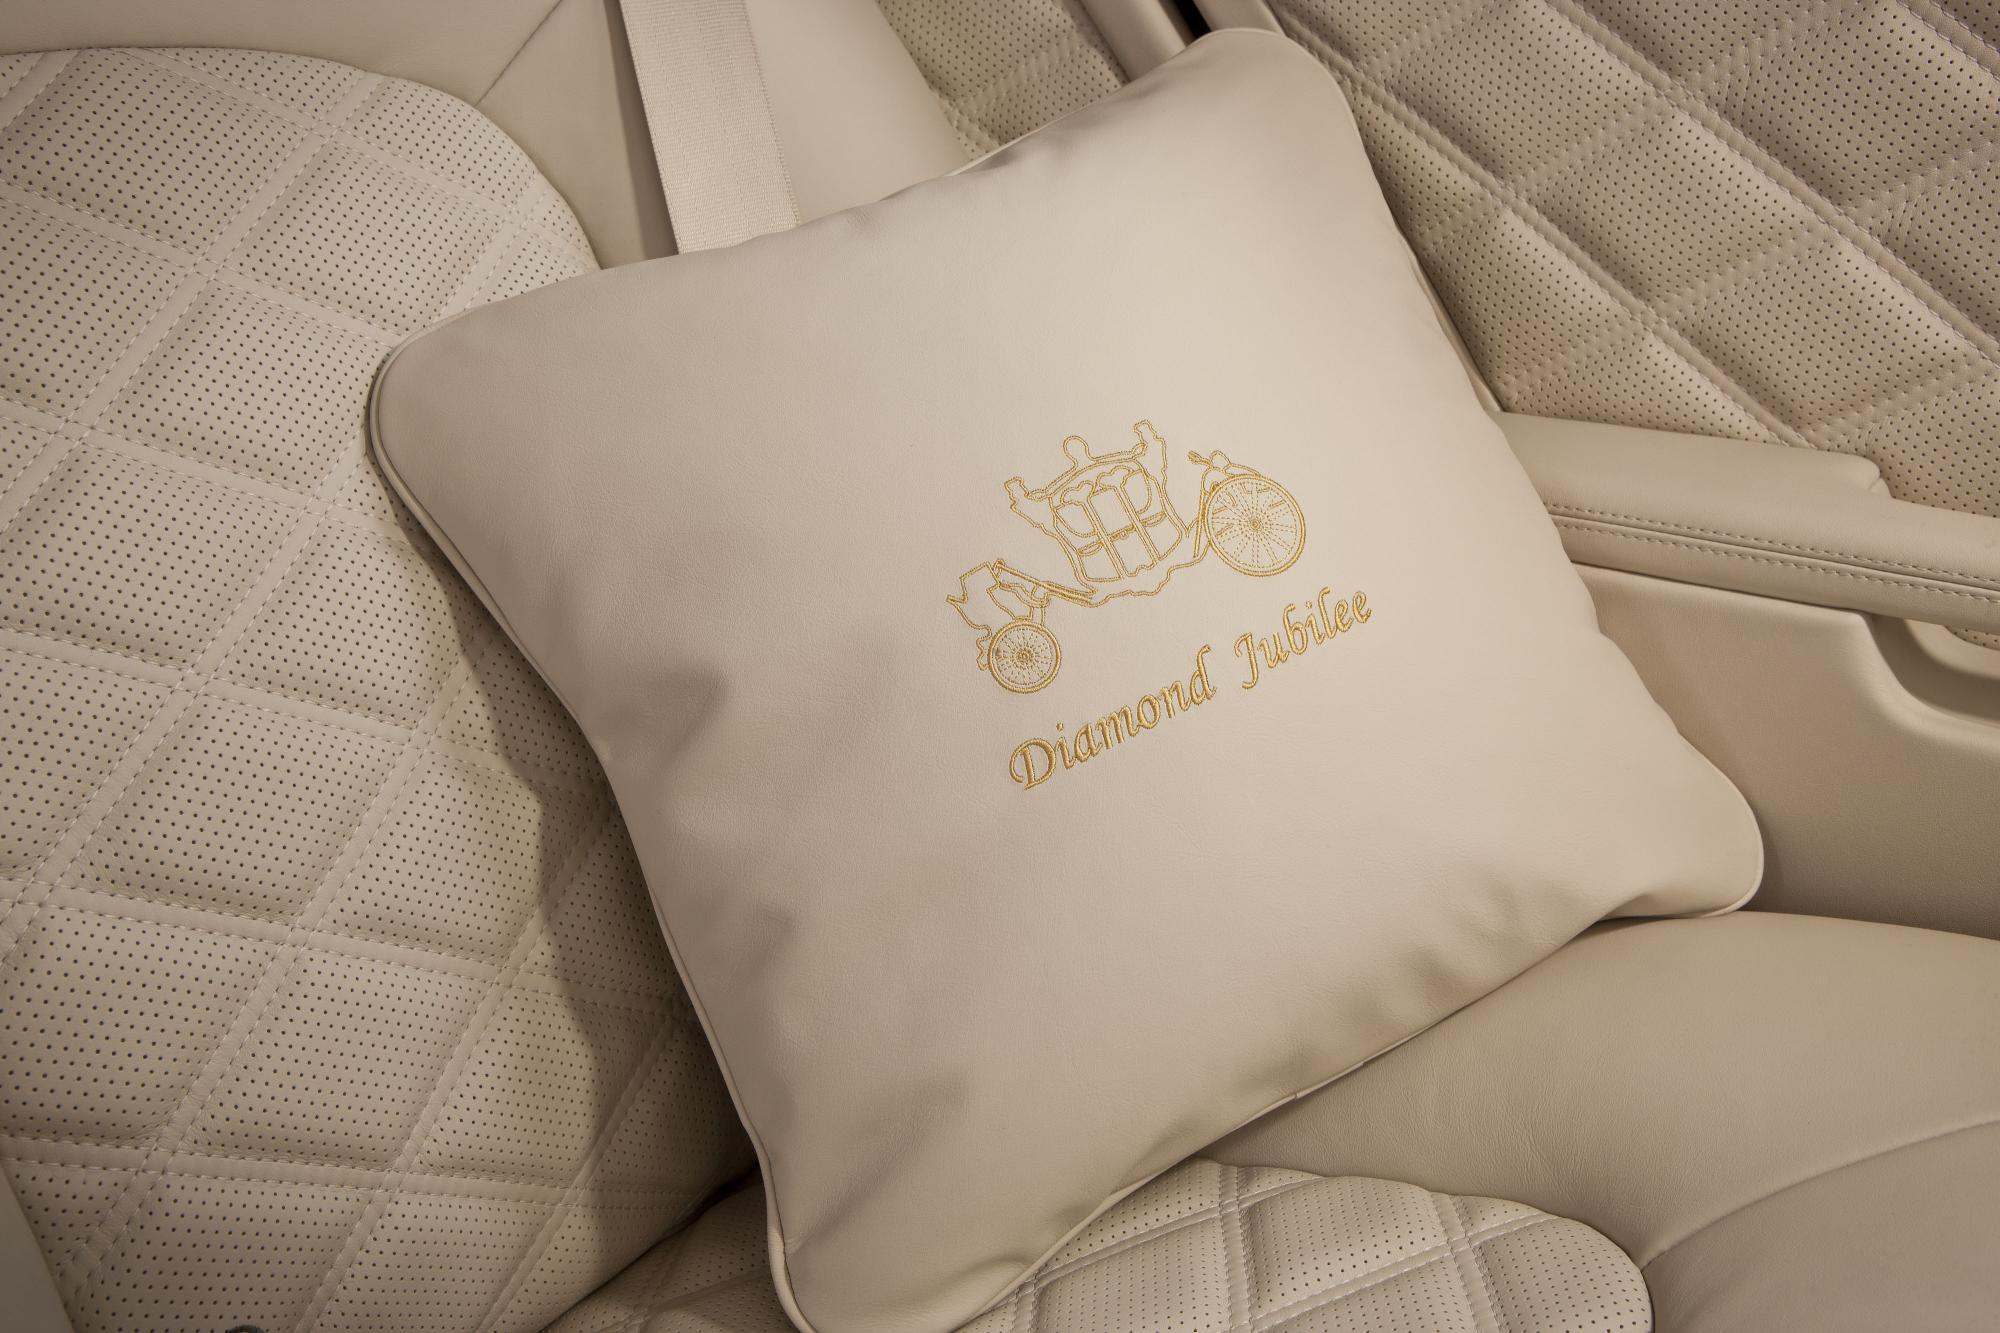 Bentley Mulsanne Diamond Jubilee Edition Cushion